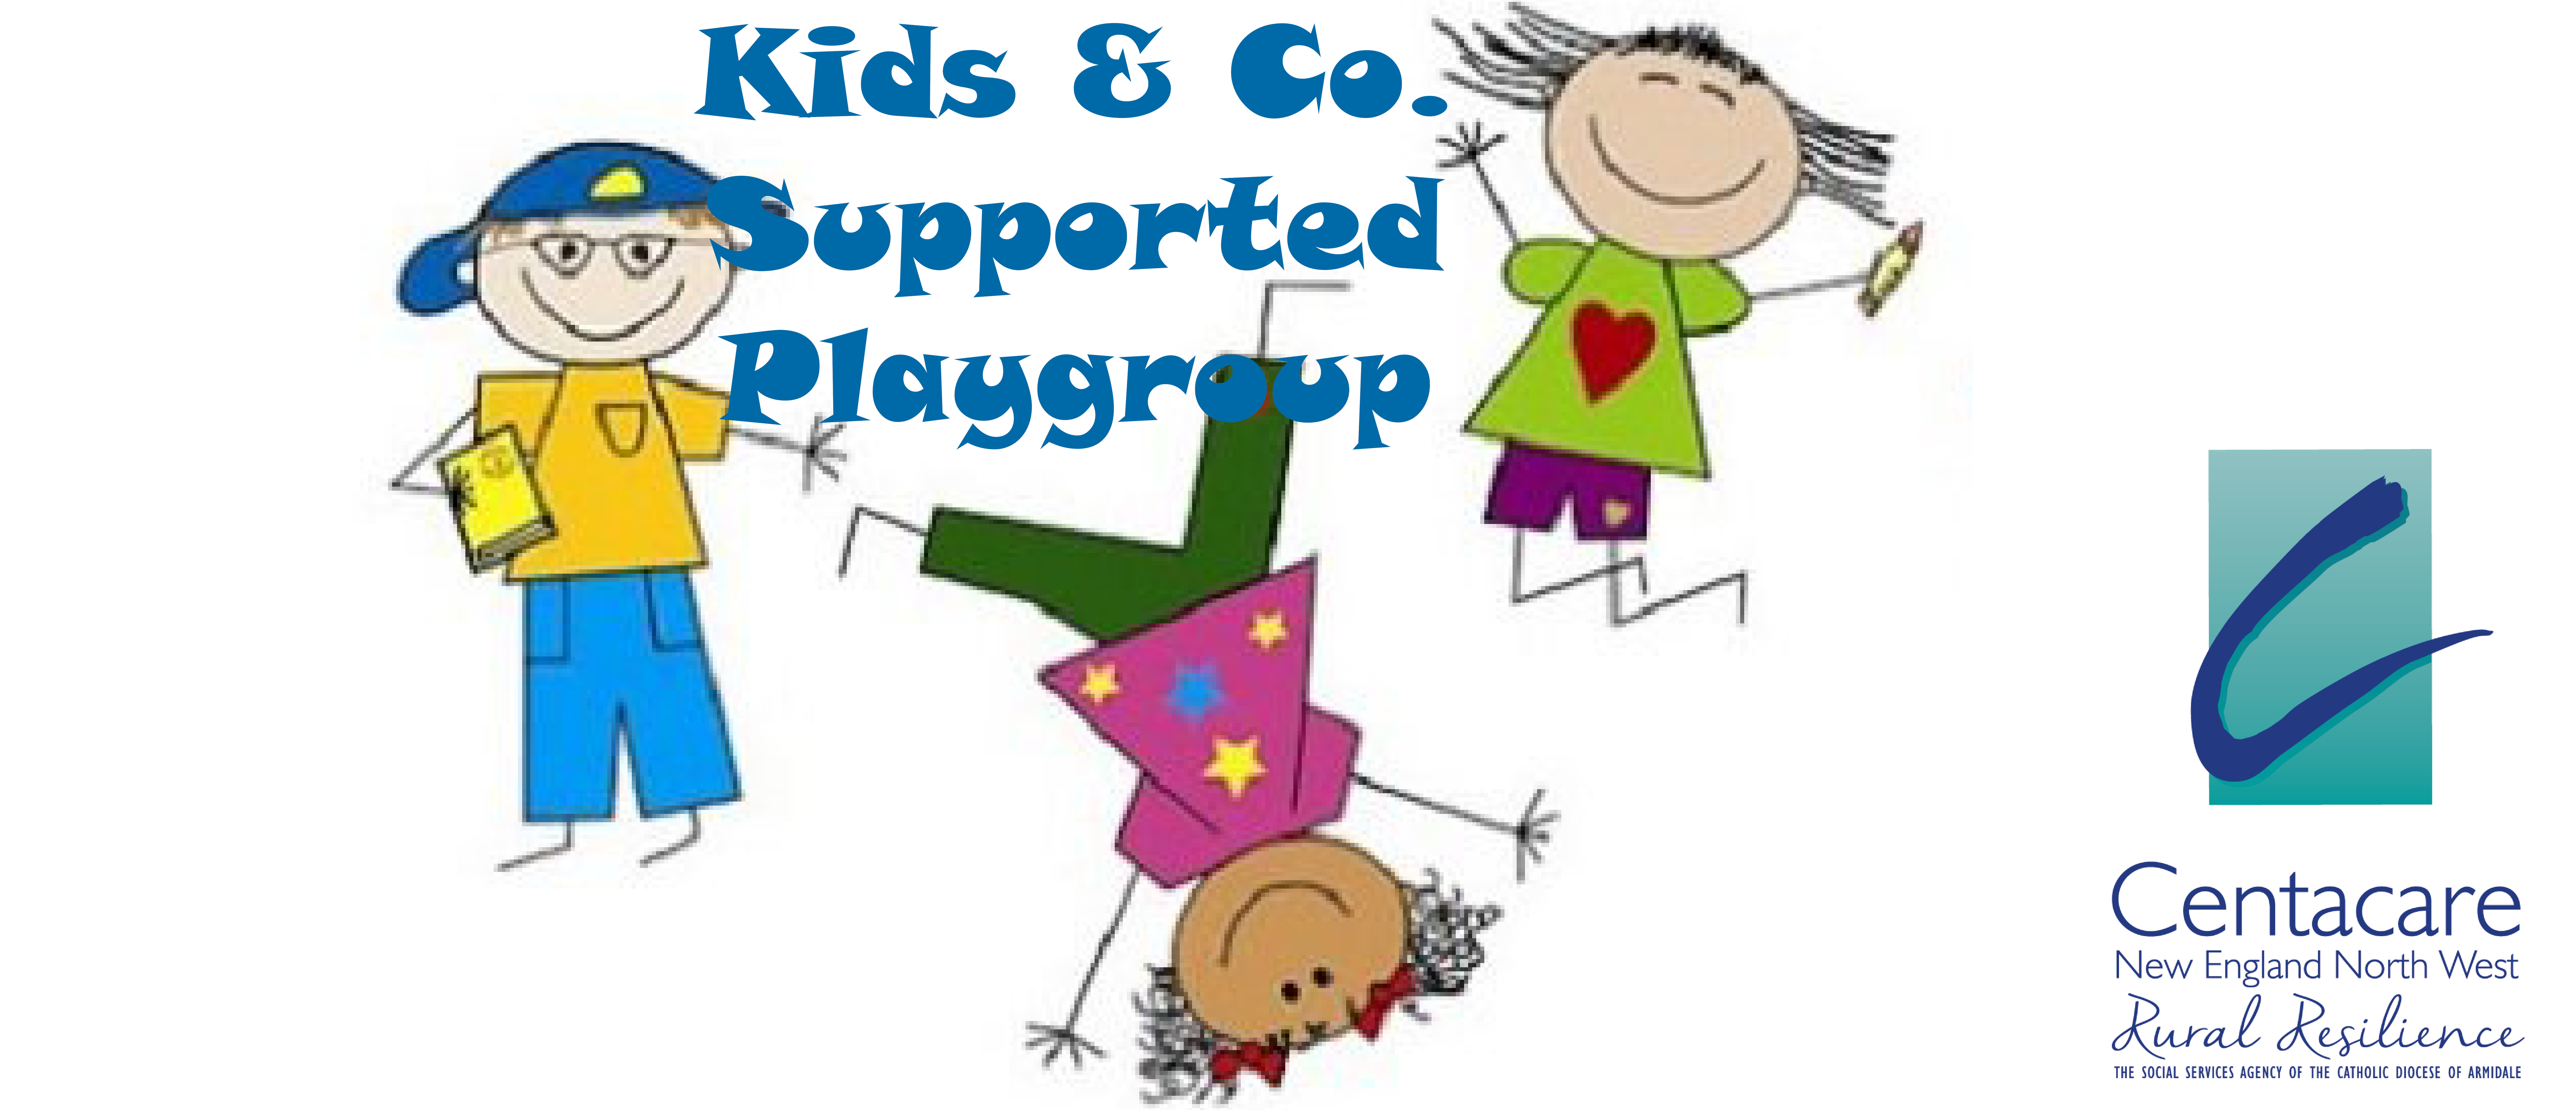 Kids & Co - Inverell